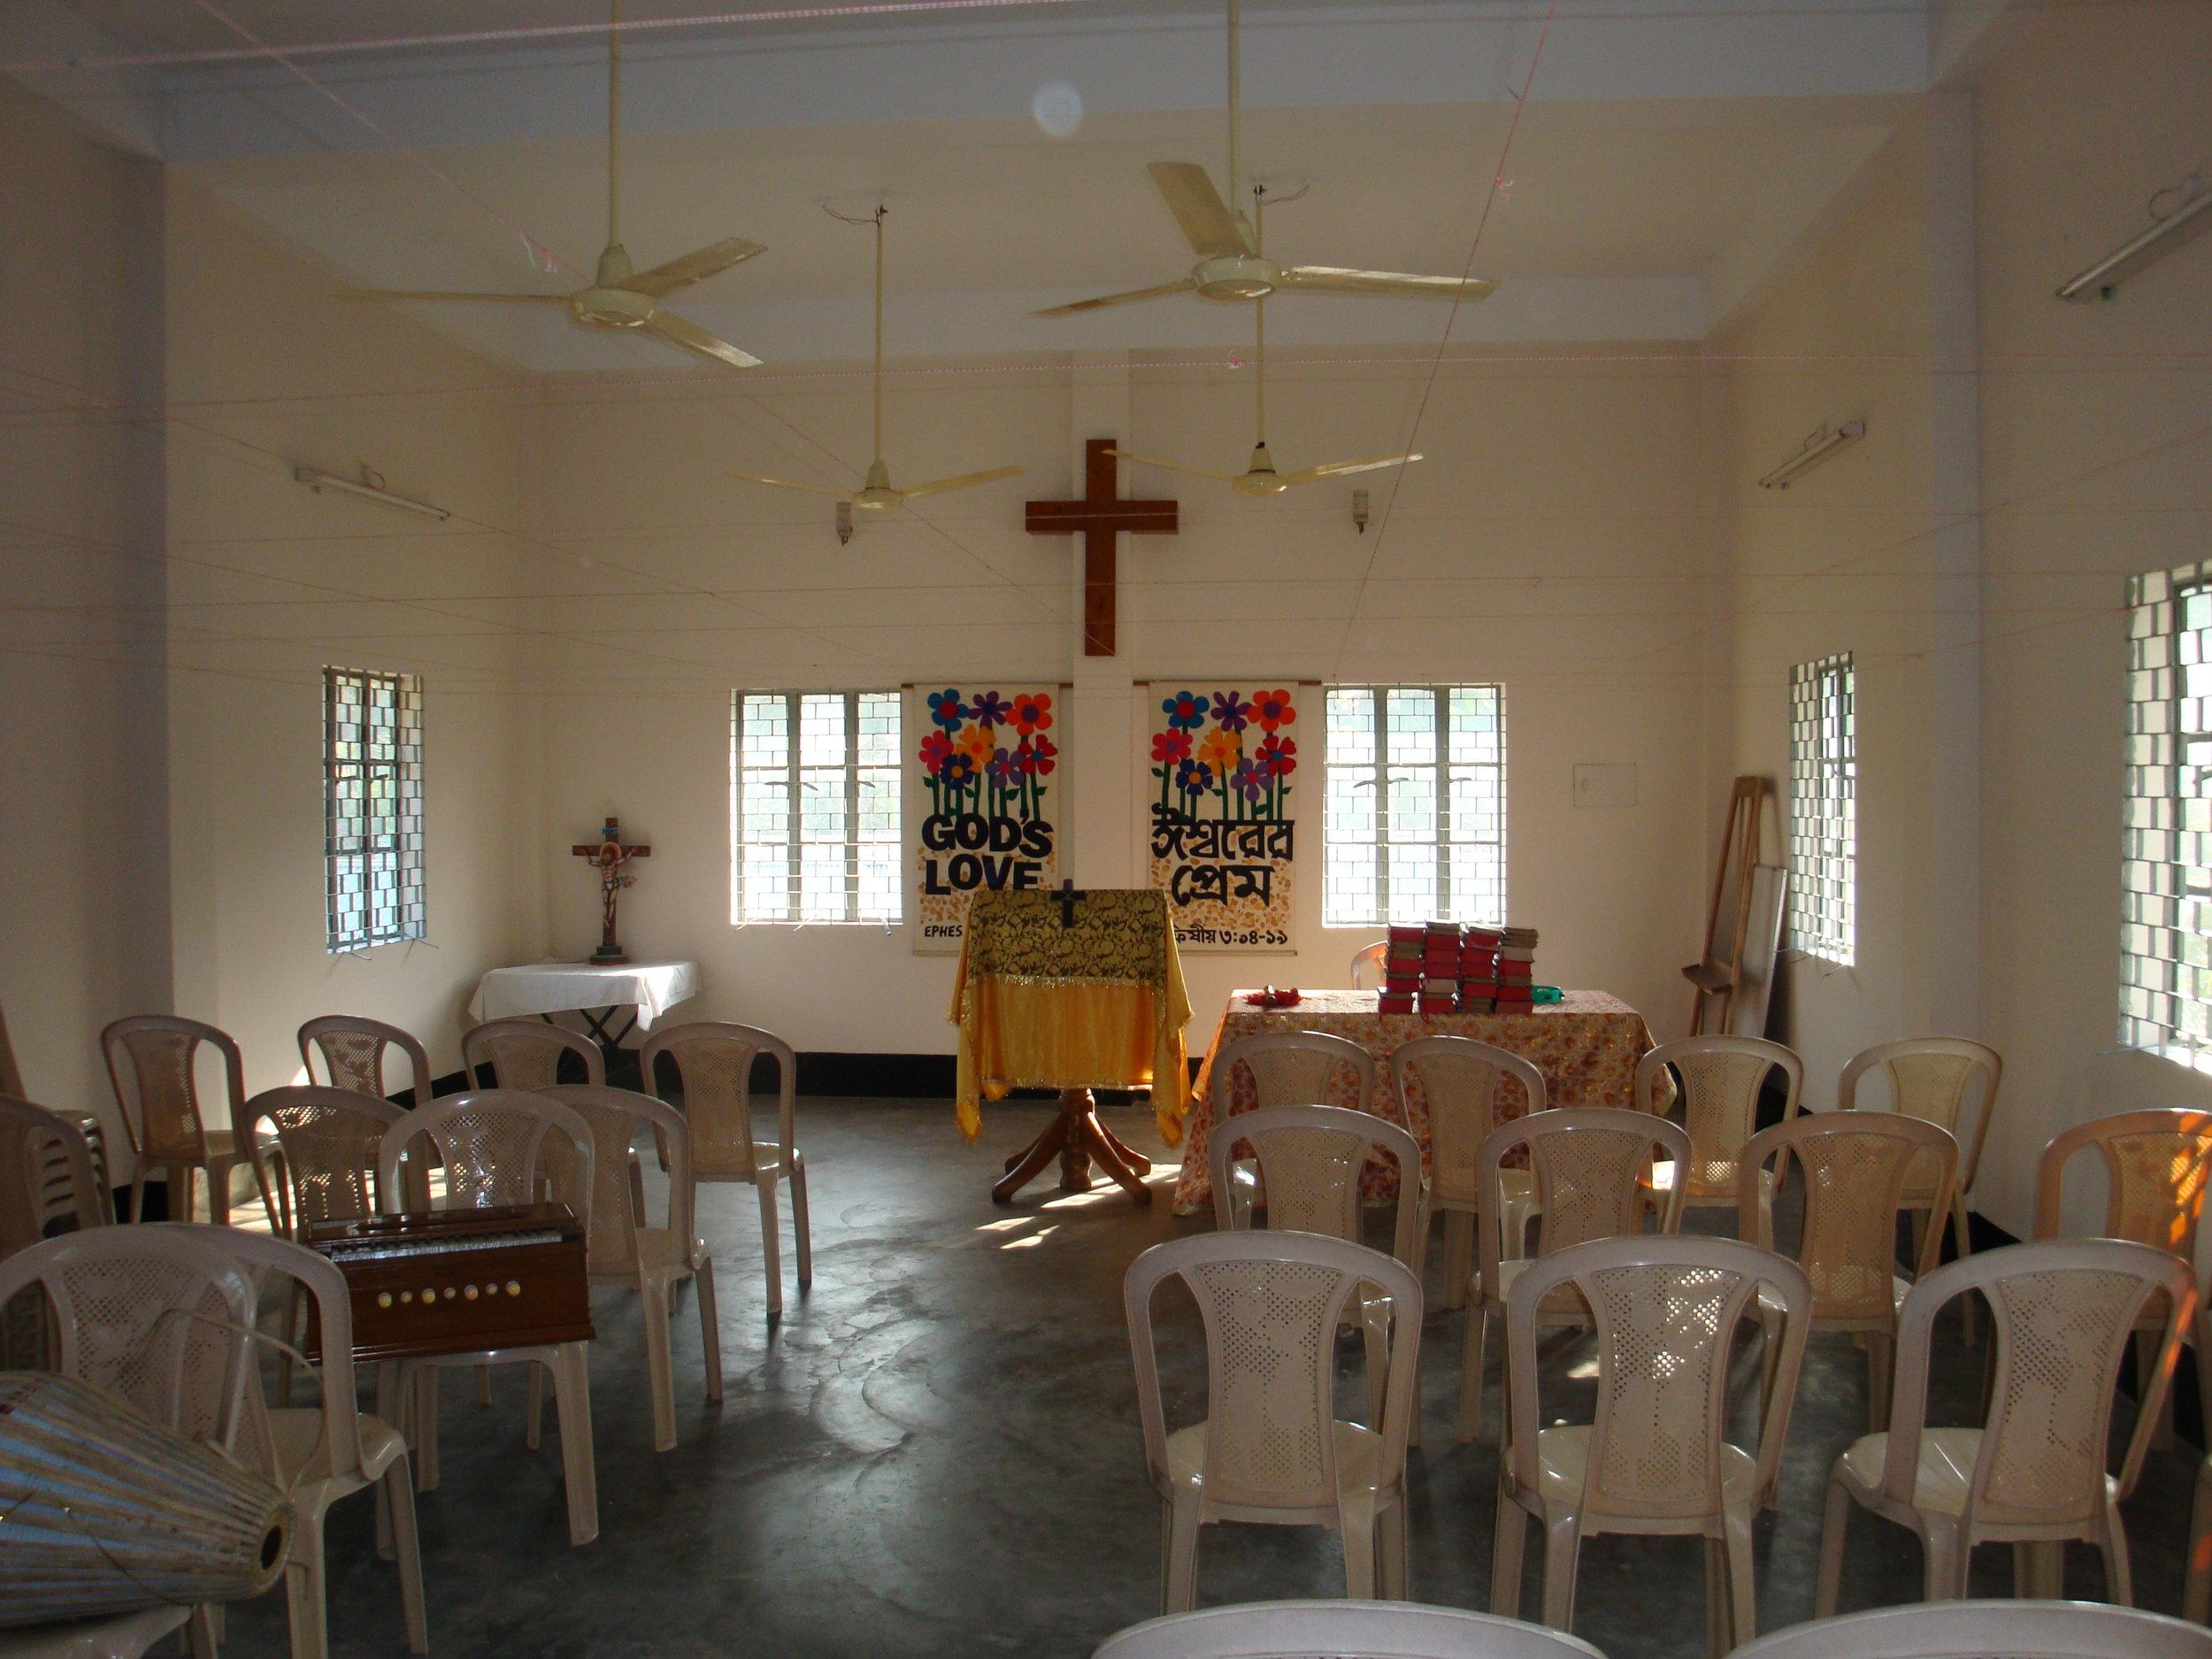 Christian families worship at LHCB's Church of Dumki